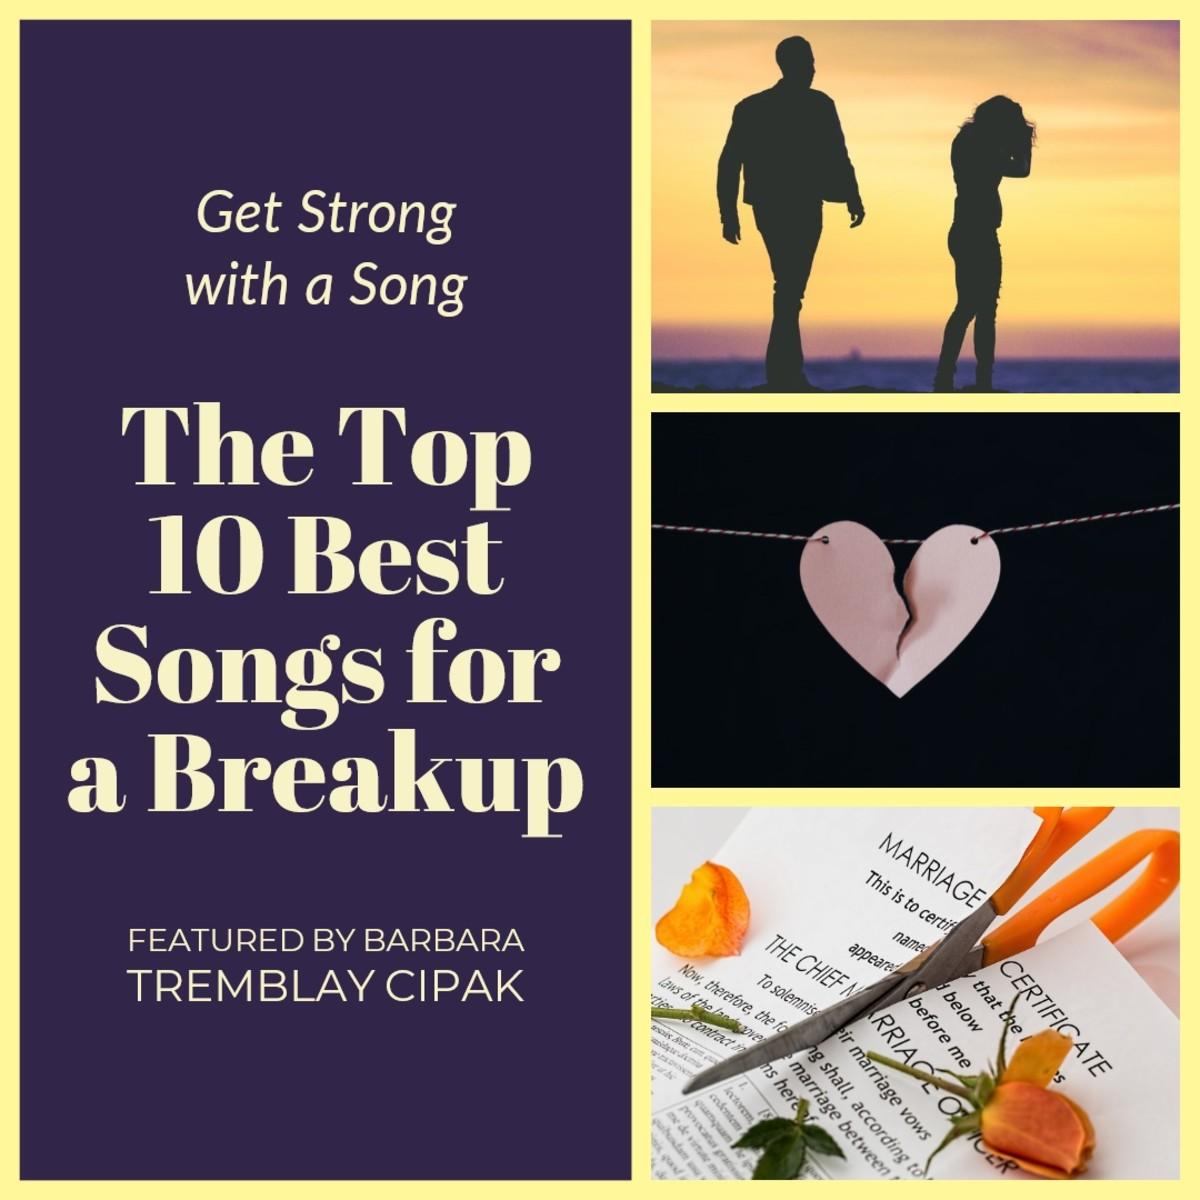 Top 10 Best Songs for a Breakup